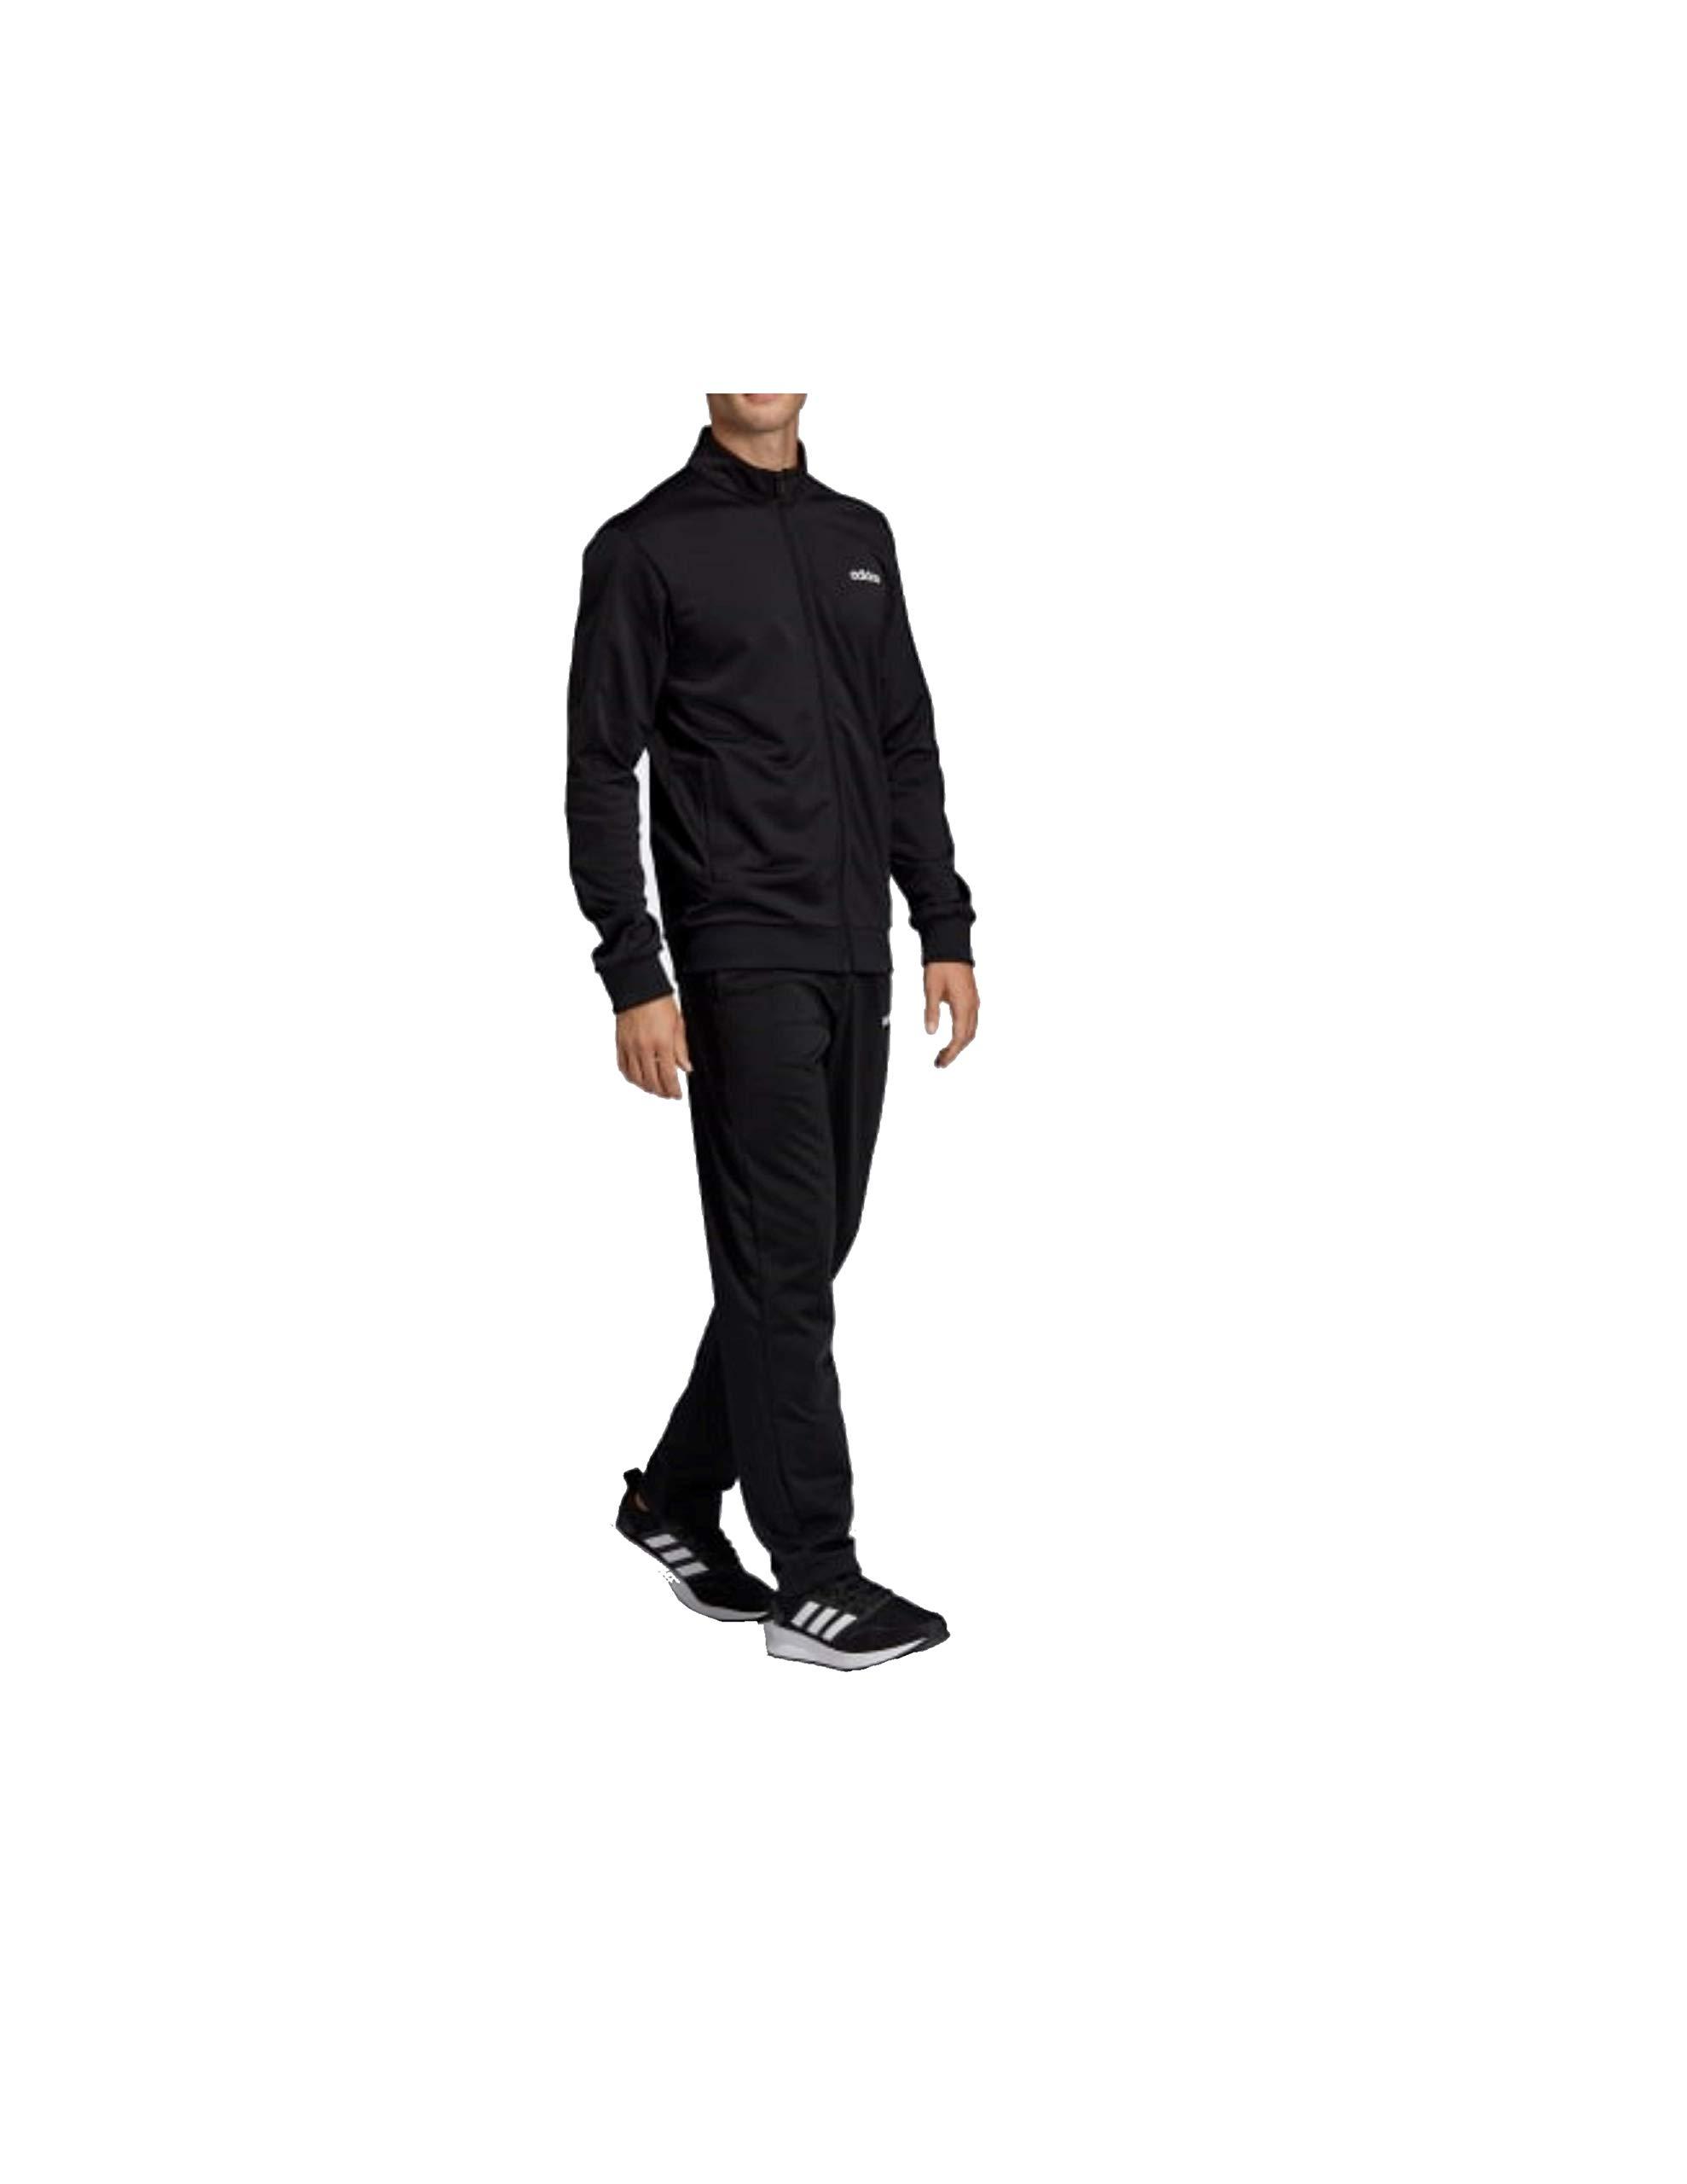 adidas Men Training Basics Track Suit (MTS) Size XL Black by adidas